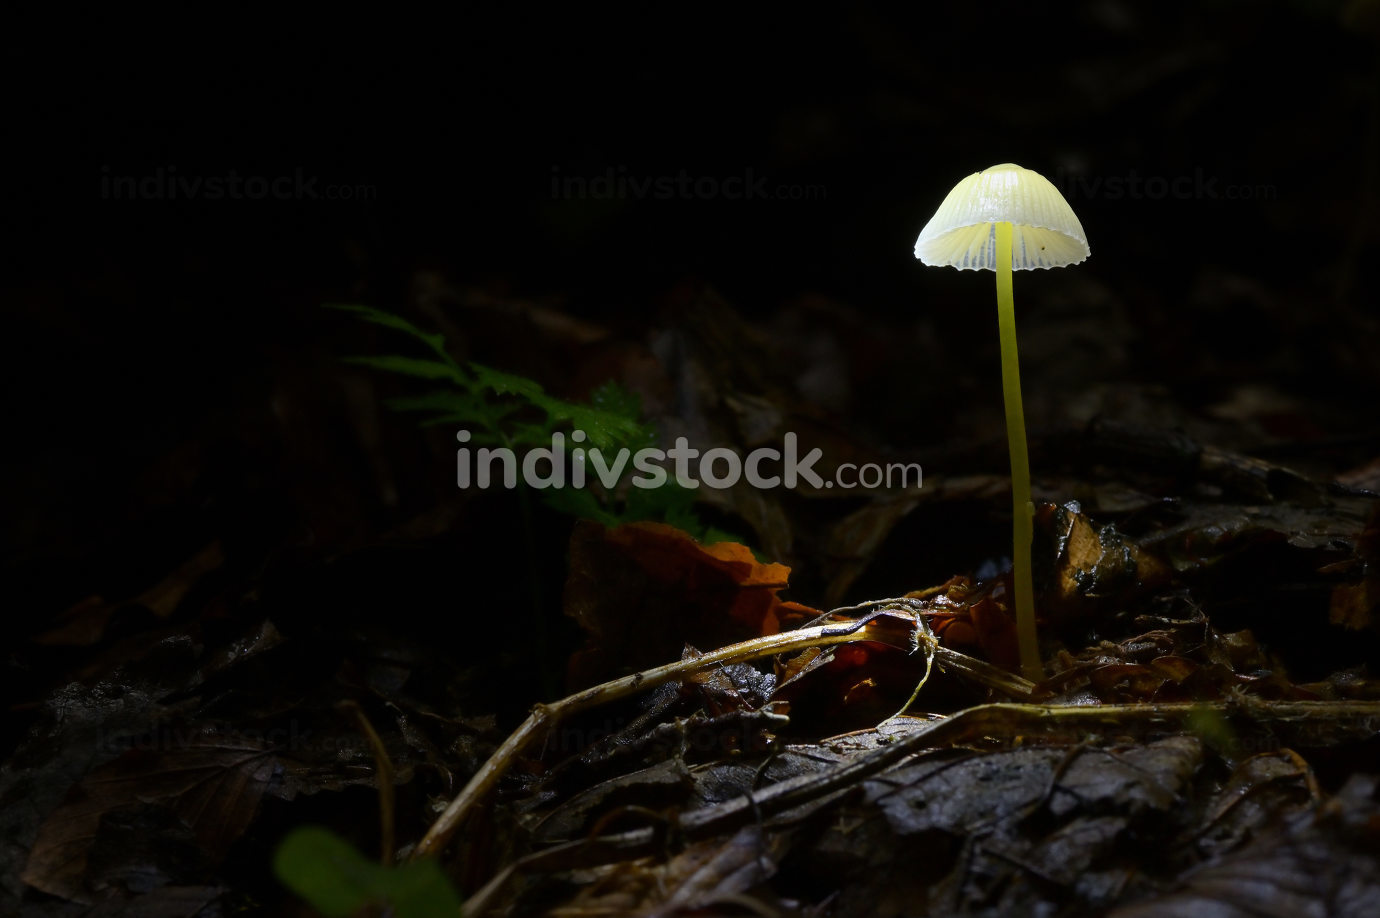 Glowing Mushroom Mycena In Dark Forest